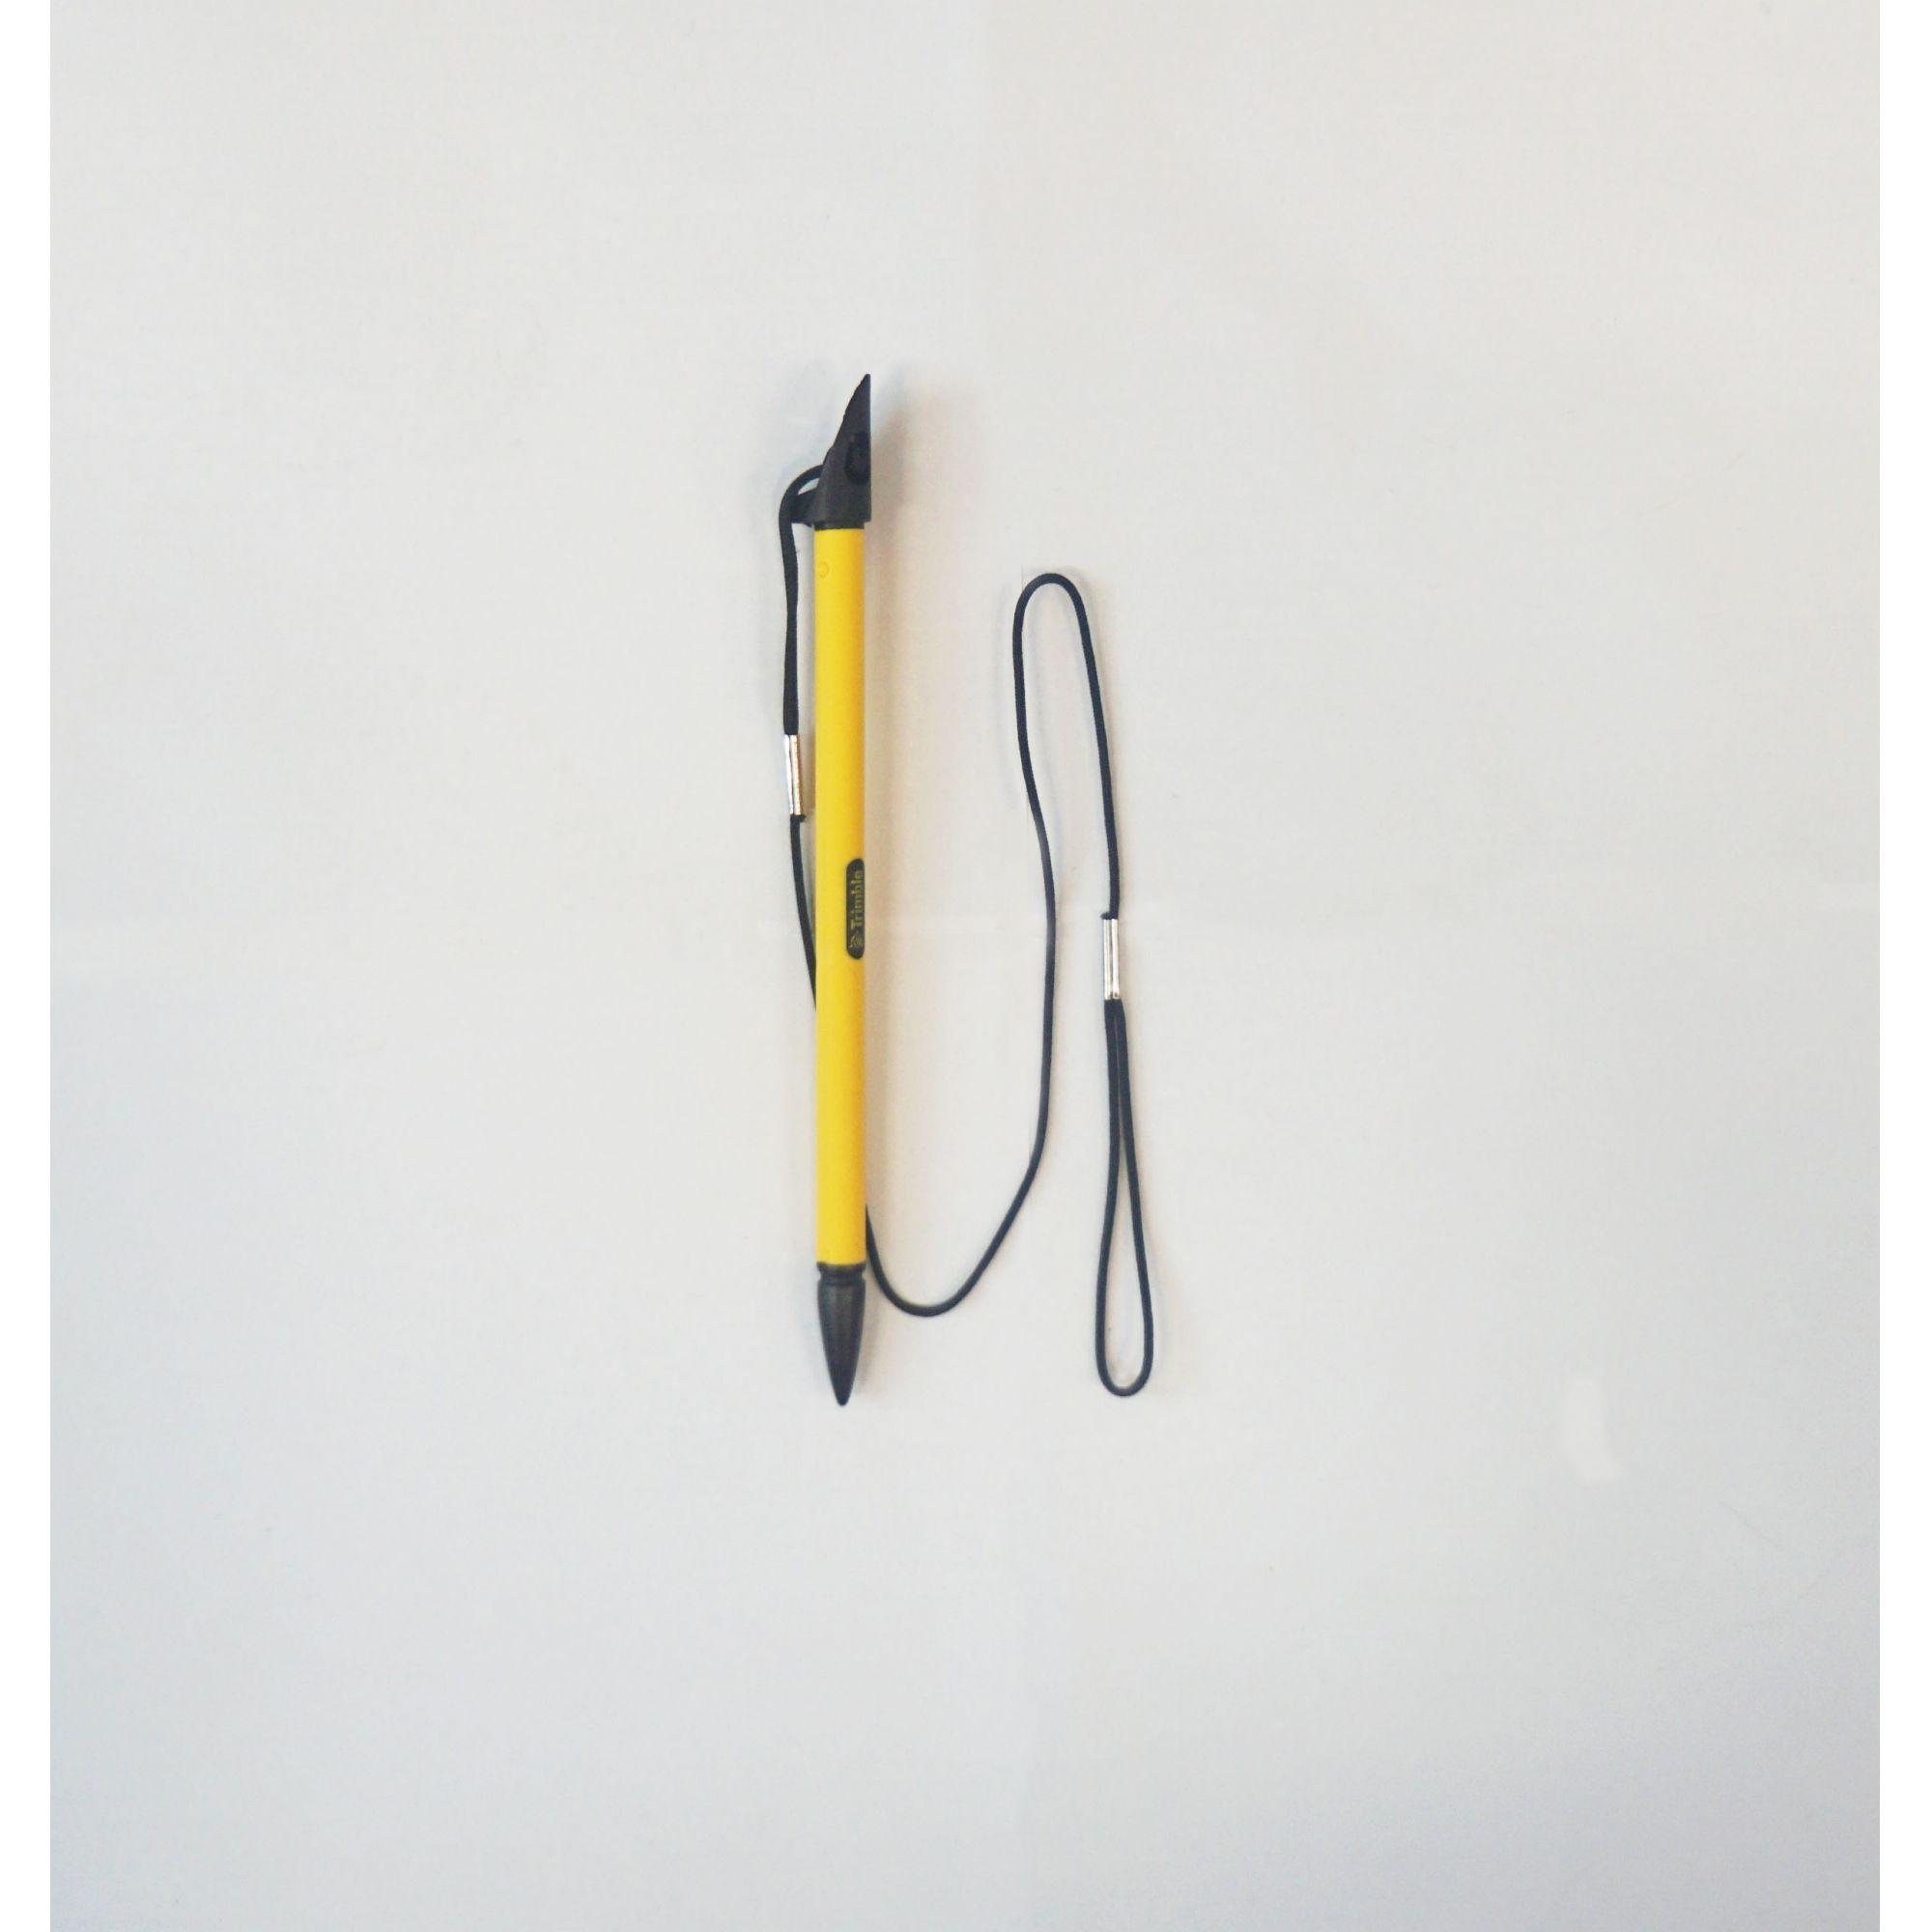 Canetas stylus para Geo 6000 / Geo 7